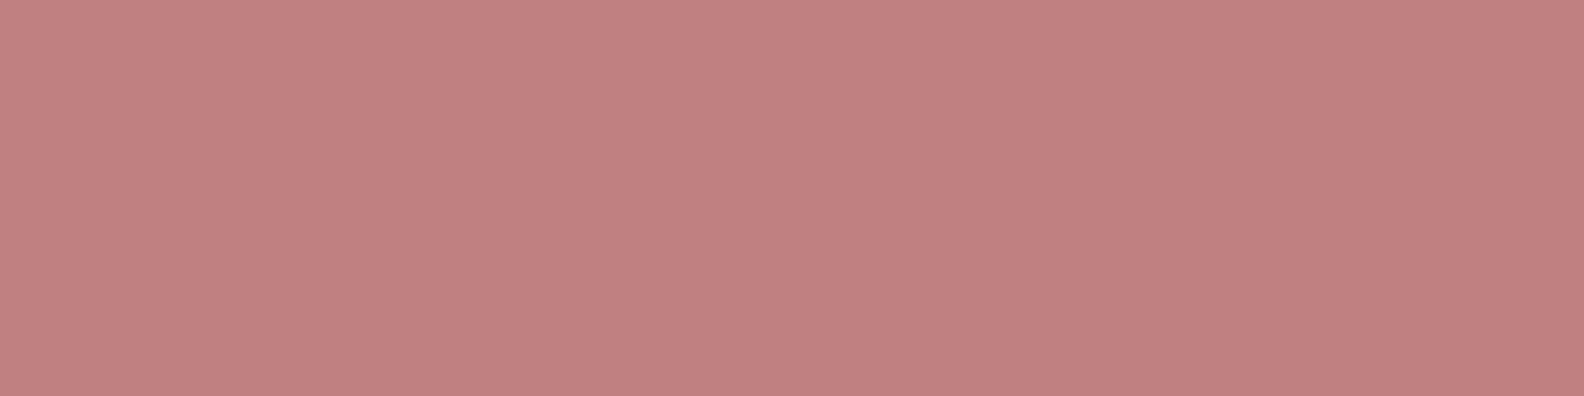 1584x396 Old Rose Solid Color Background